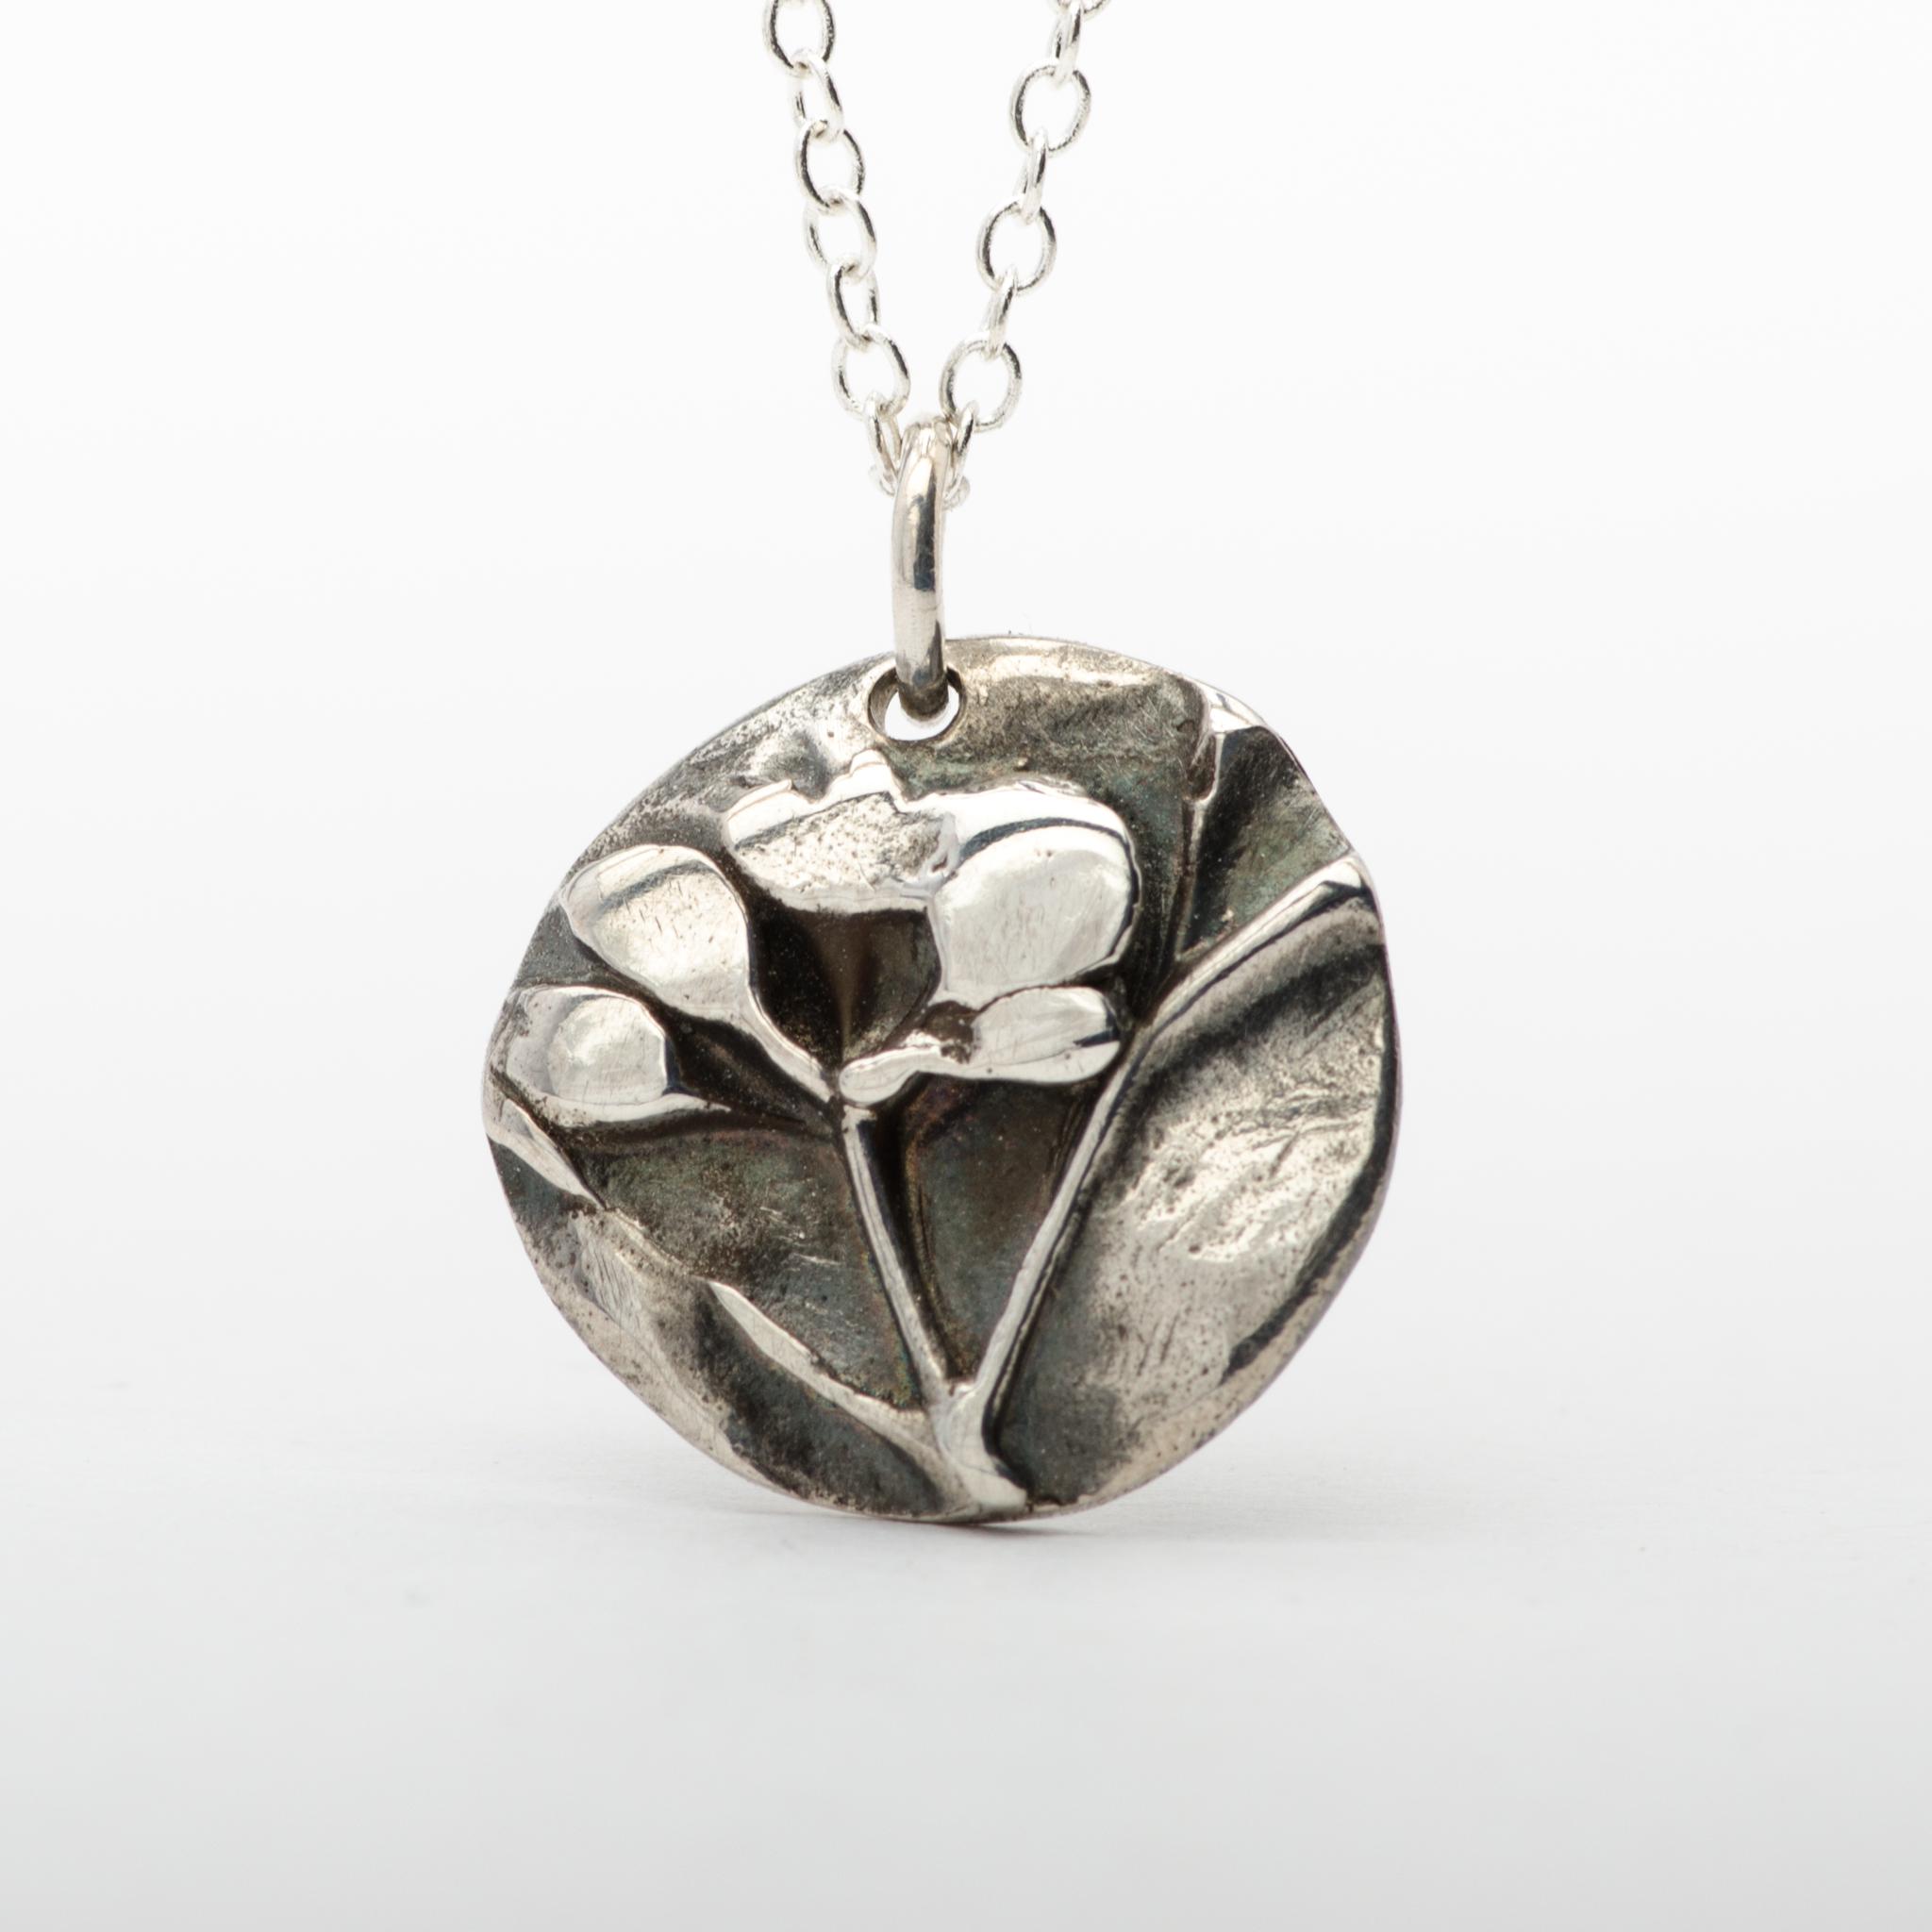 Wild Flowers Pendant Necklace Sterling Silver Women Jewelry